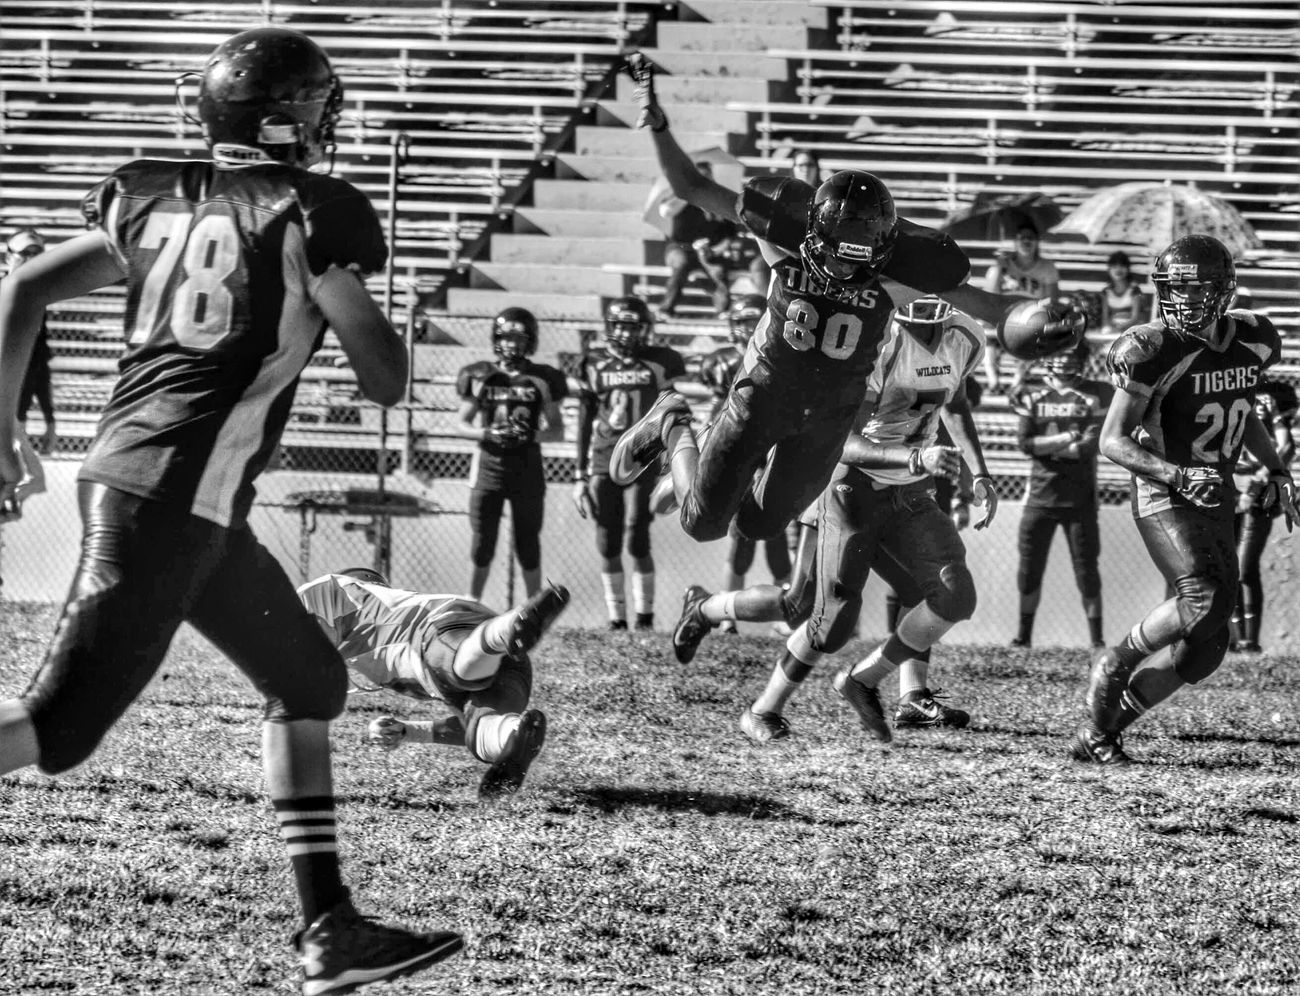 Football Highschool Los Angeles, California Black & White